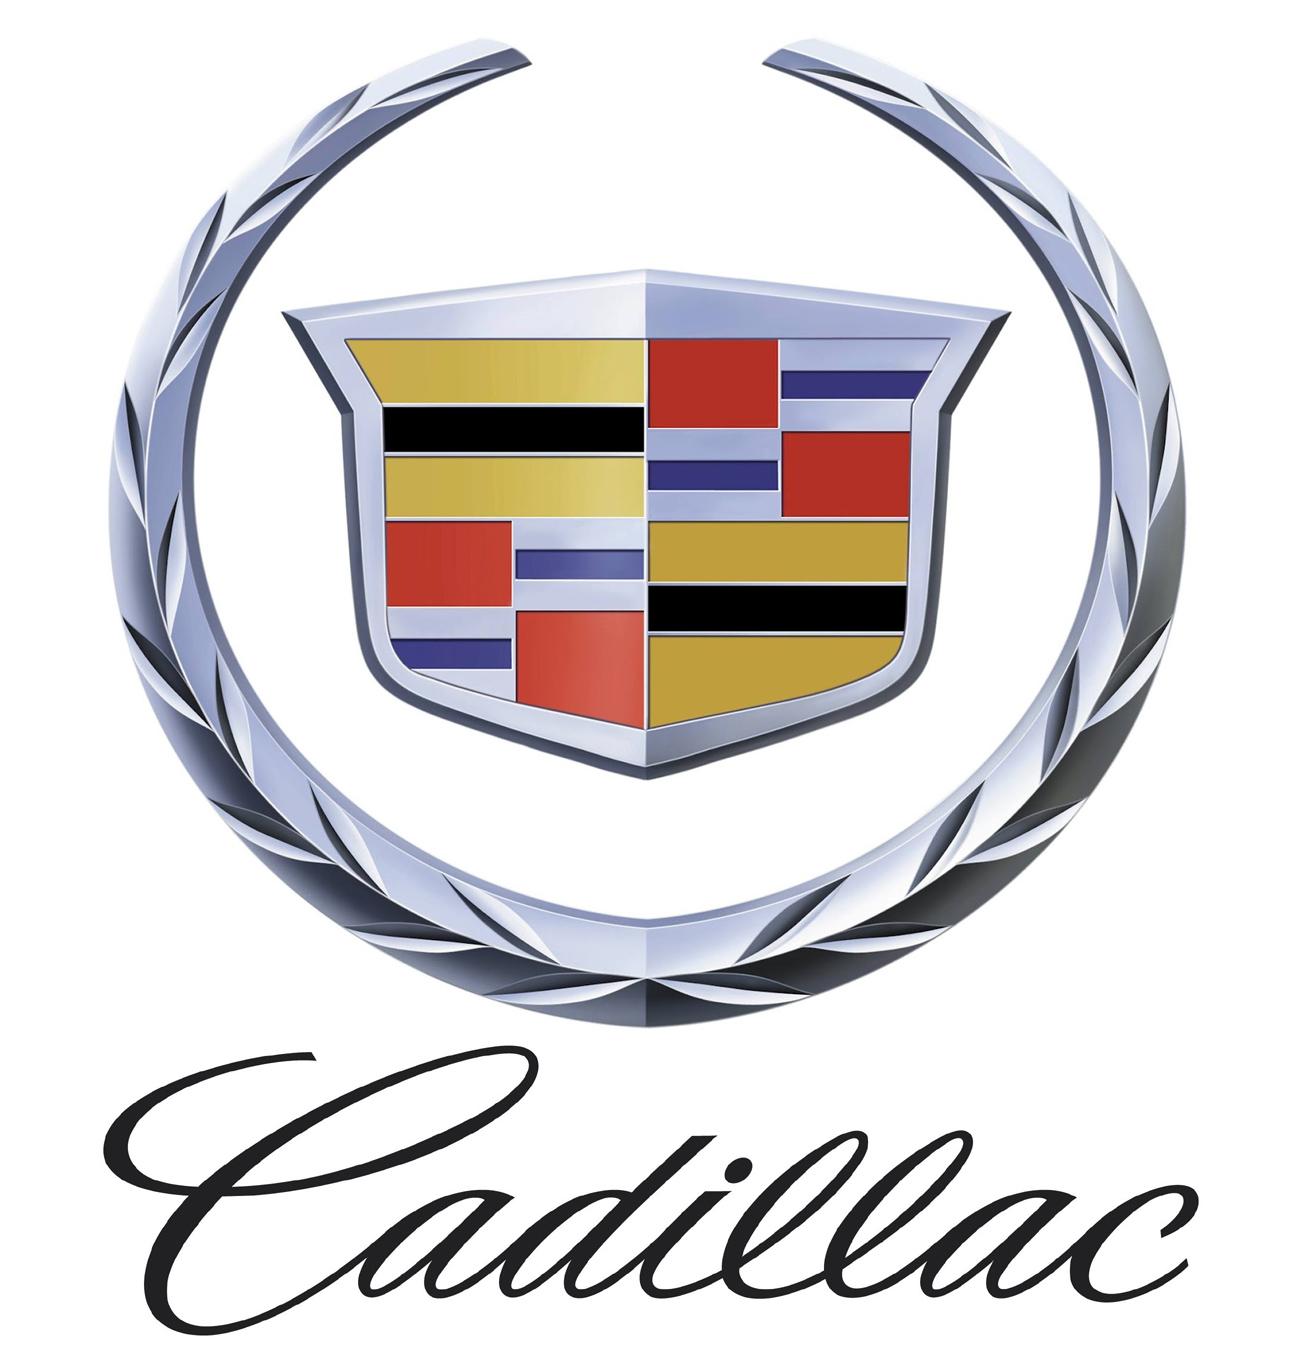 cadillac hd logo wallpaper cadillac hd logo wallpaper gallery 1300x1372